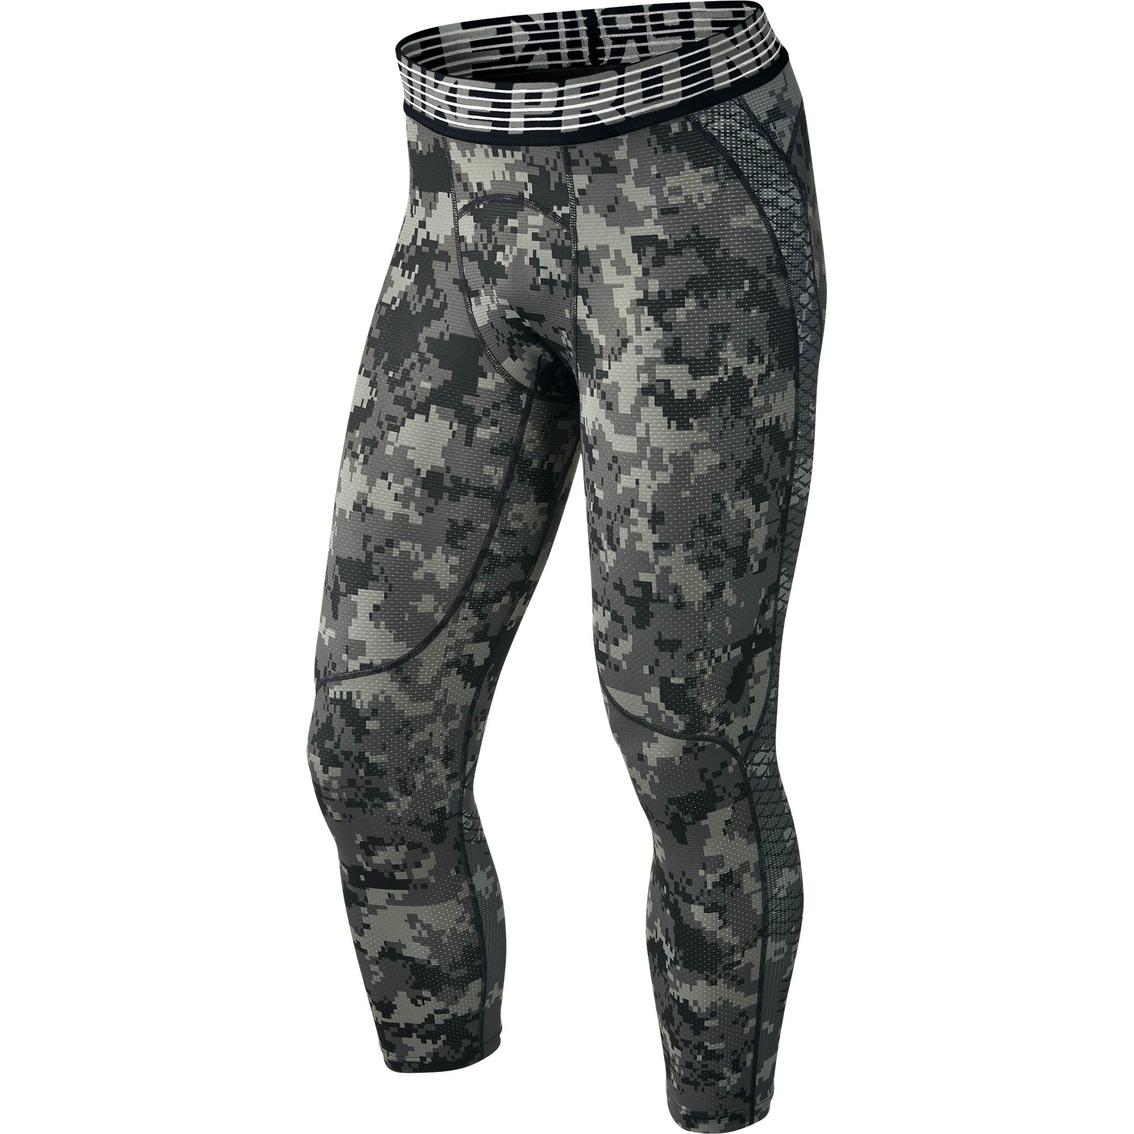 fa7b2df3b463 Nike Men s Hypercool 3 4 Digi Camo Tights